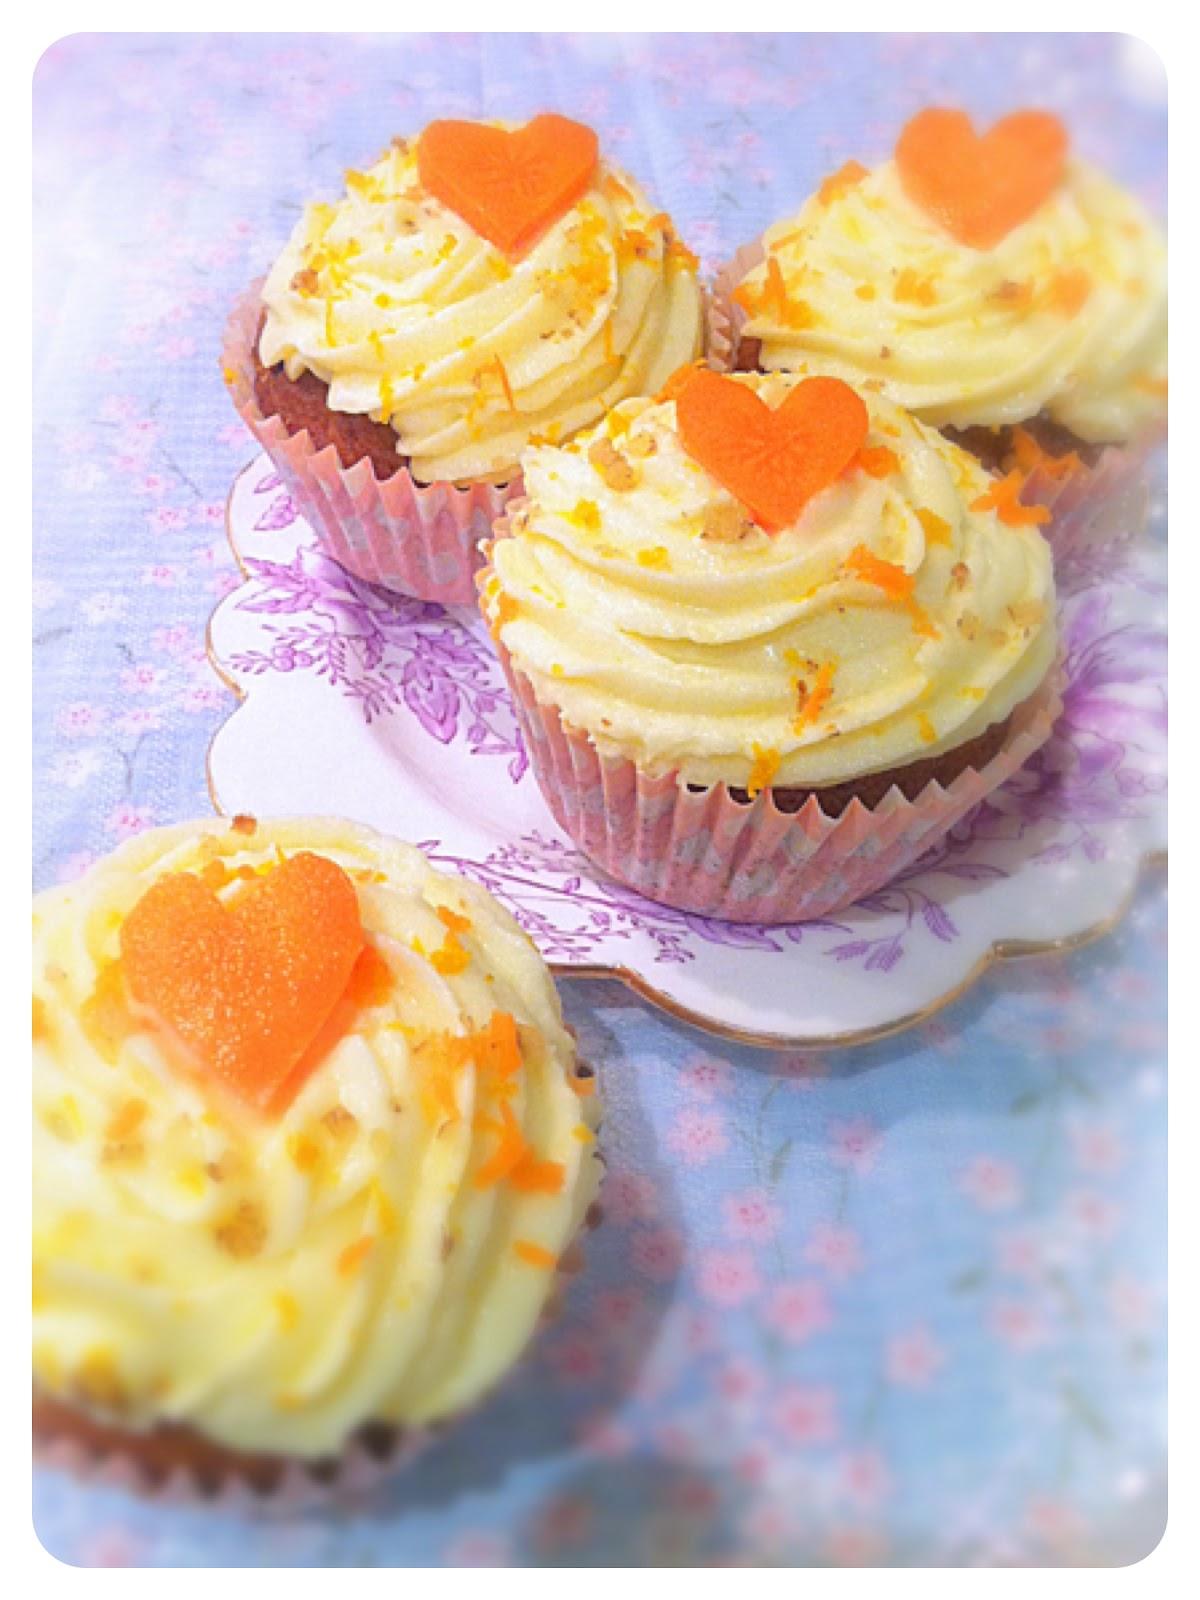 Carrots Cinnamon And Cream Chesse Cake